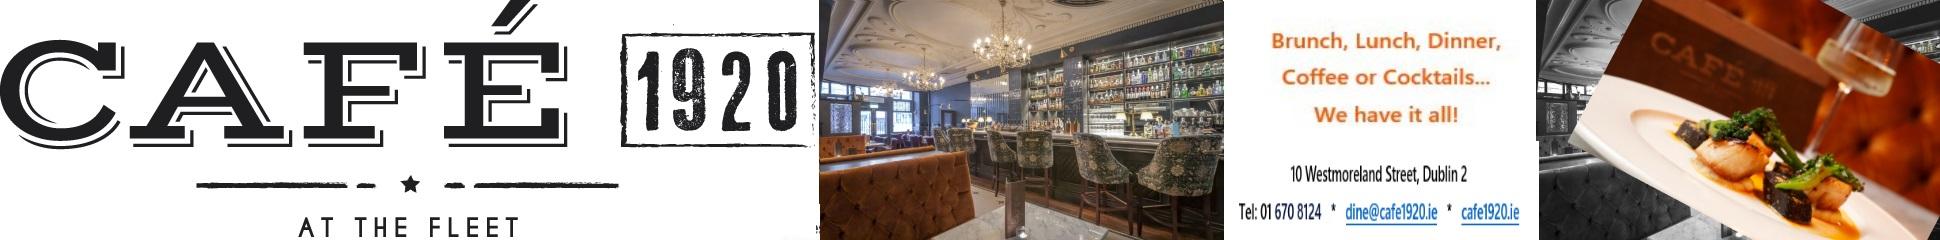 Café 1920 opening